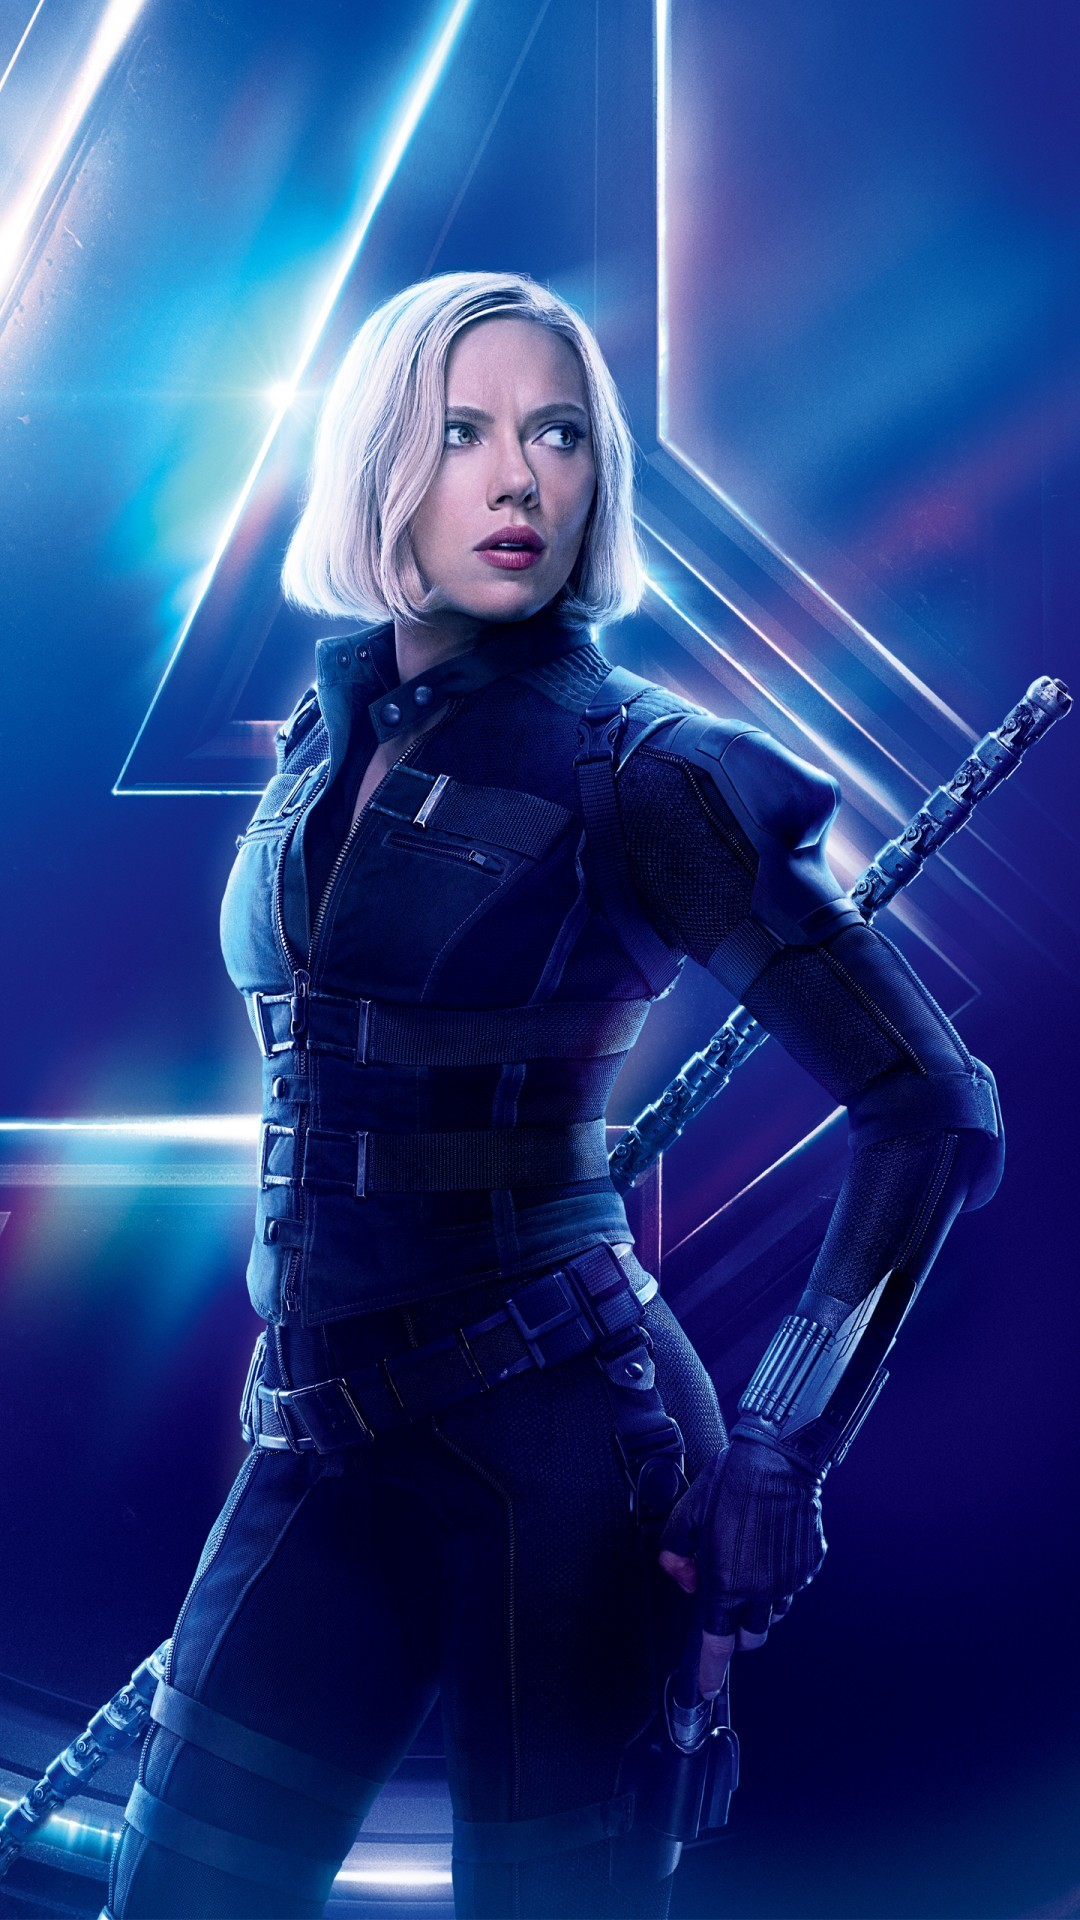 18 Black Widow Infinity War Wallpapers On Wallpapersafari